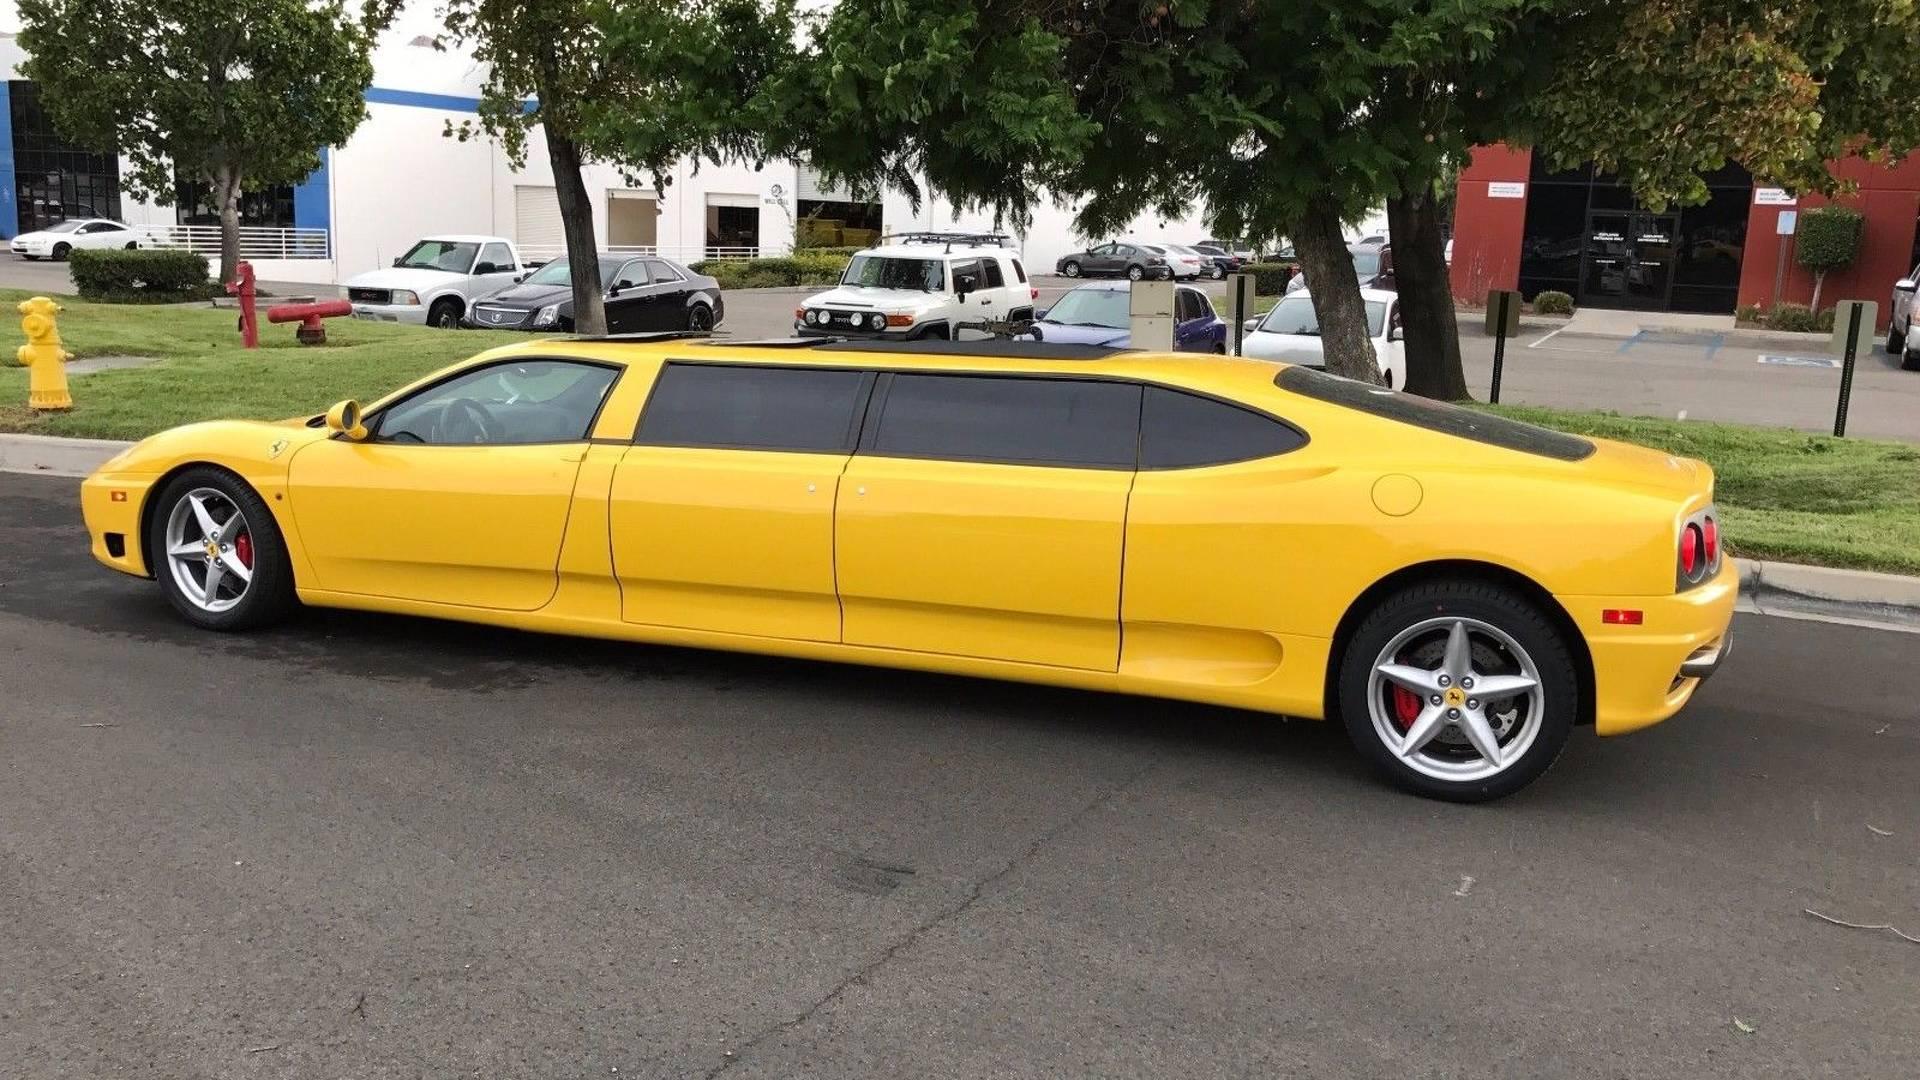 Ferrari 360 Limo Gets 104 400 Bid On Ebay But Fails To Sell